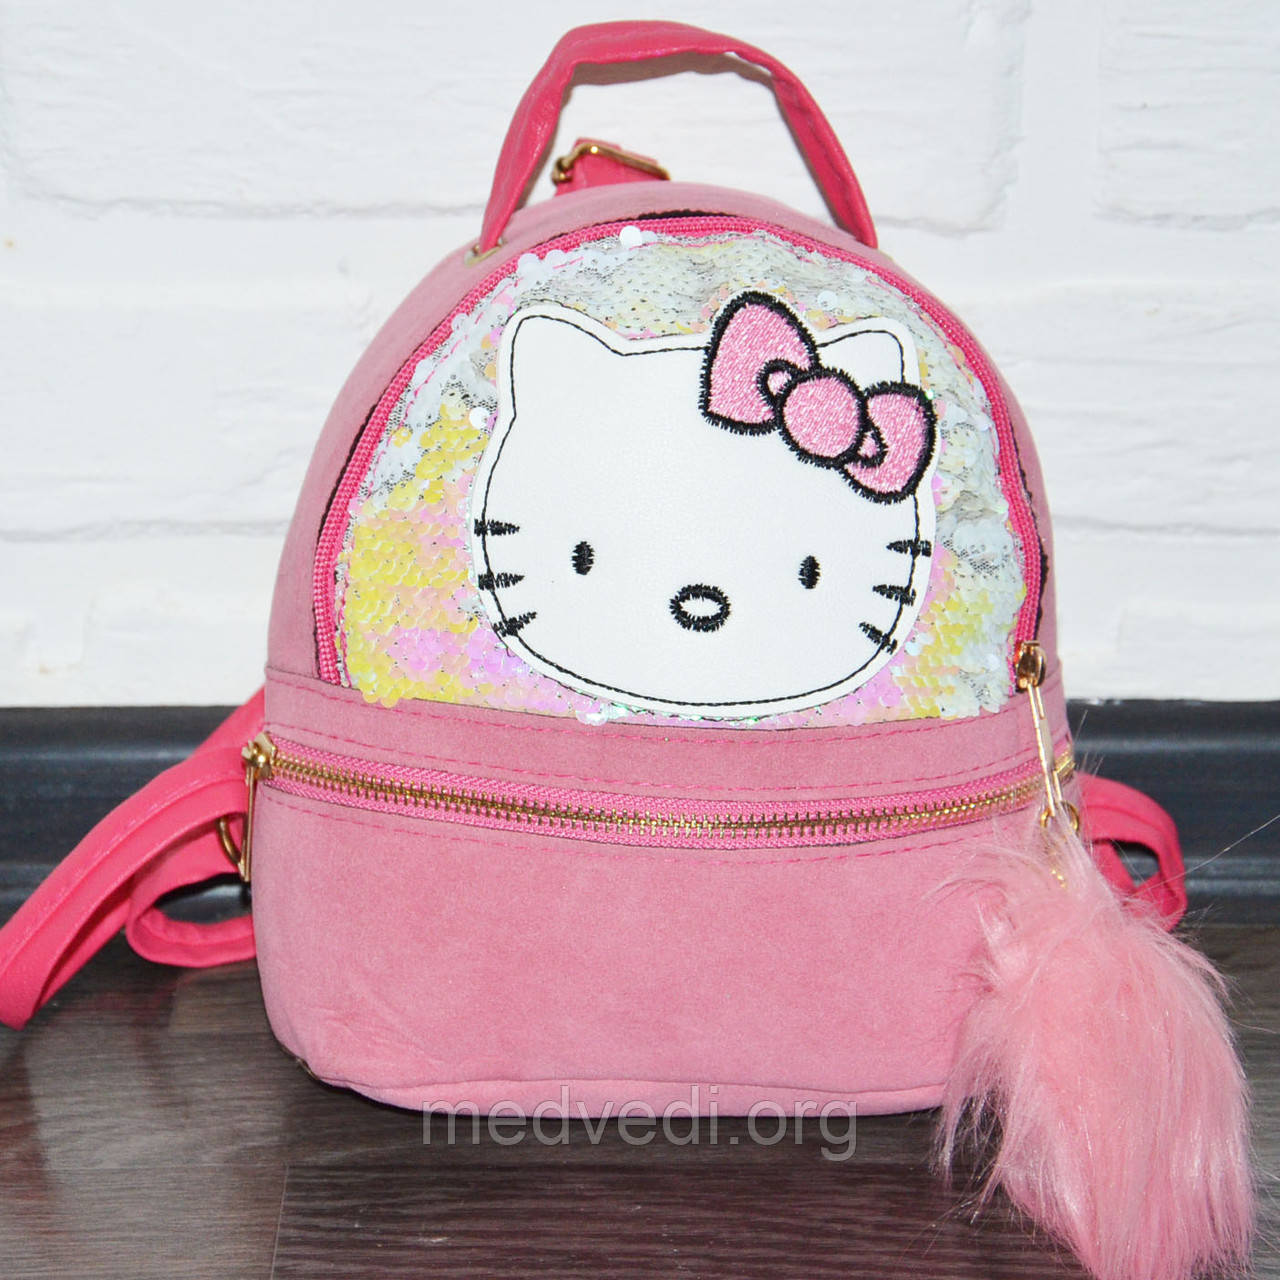 Розовый детский рюкзак с пайетками Hello Kitty (Хеллоу Китти)